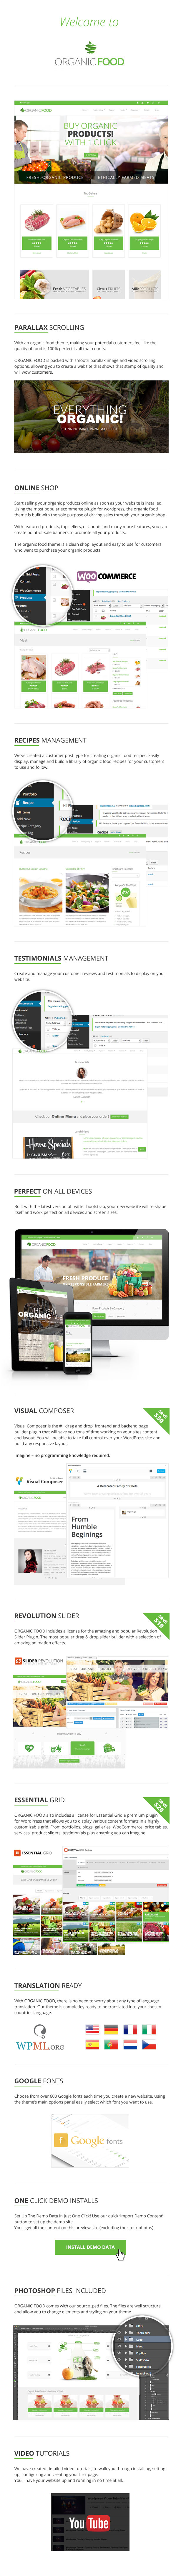 OrganicFood   Responsive WordPress Theme - 8